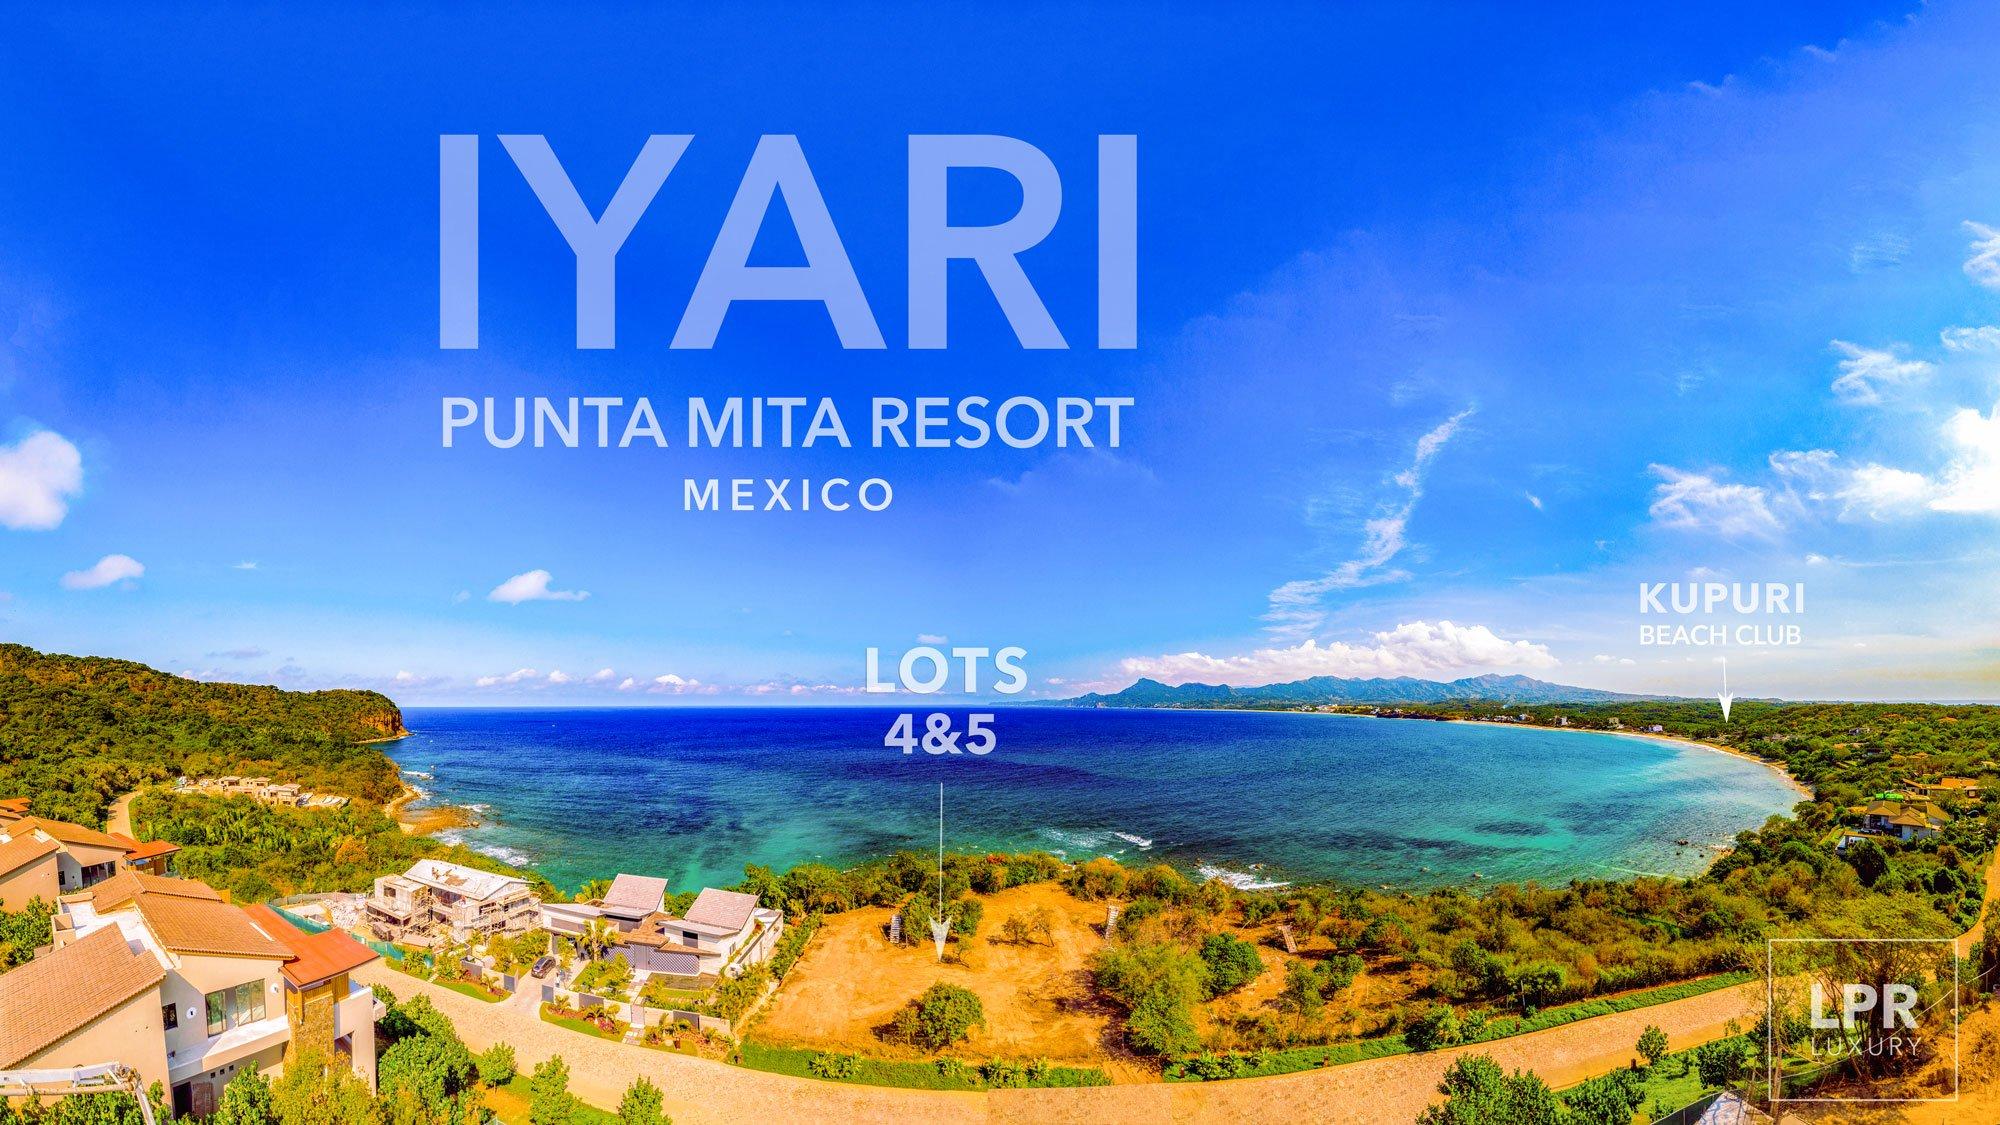 Iyari Estates & Villas - Punta Mita Resort, Riviera Nayarit, Mexico